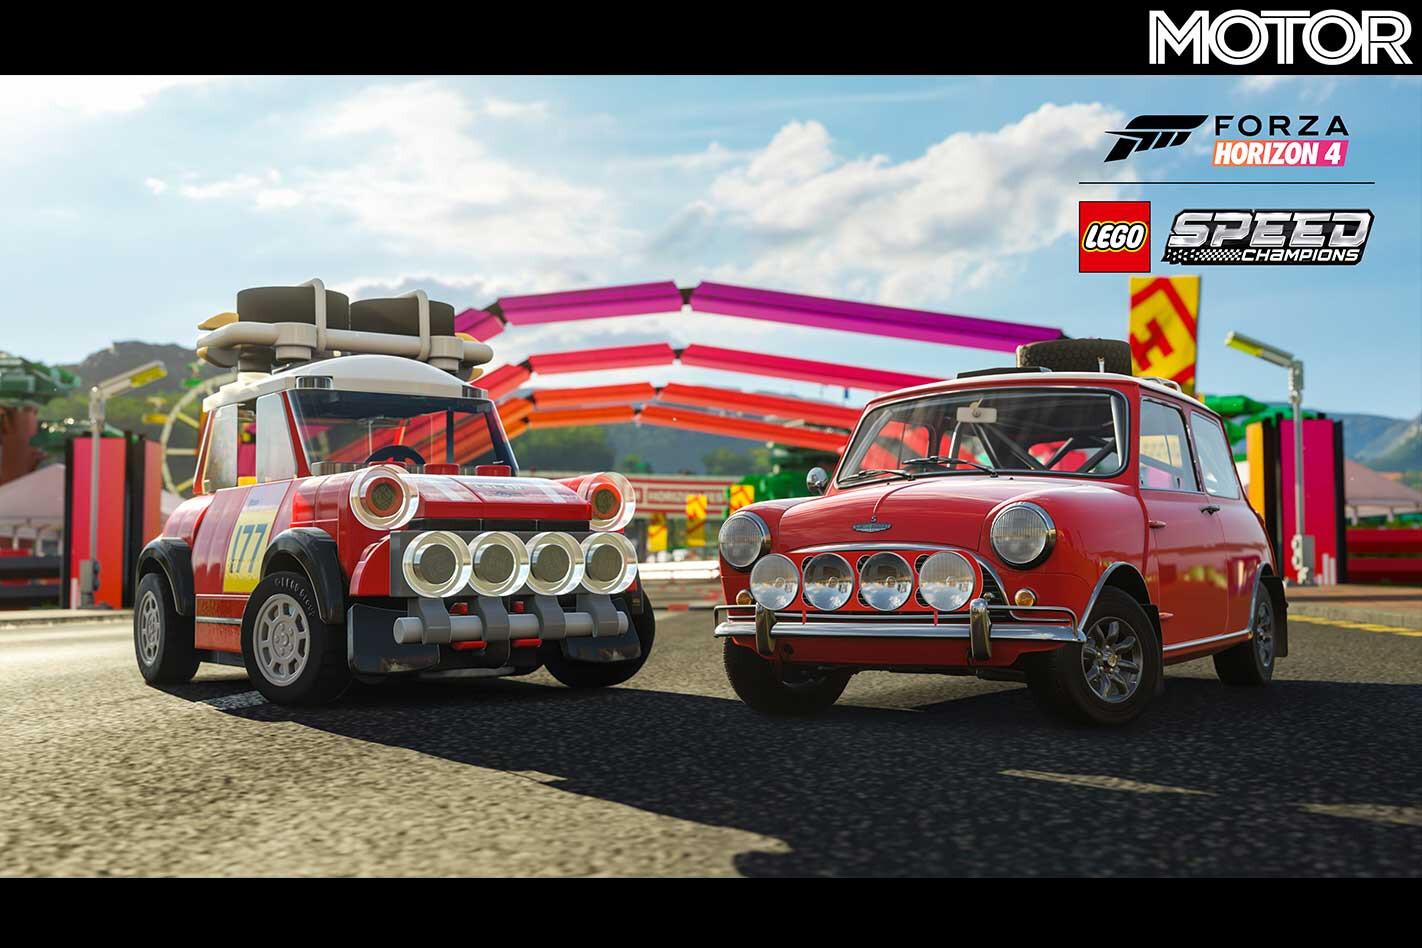 Forza Horizon 4 Lego Speed Champions Expansion Mini Jpg